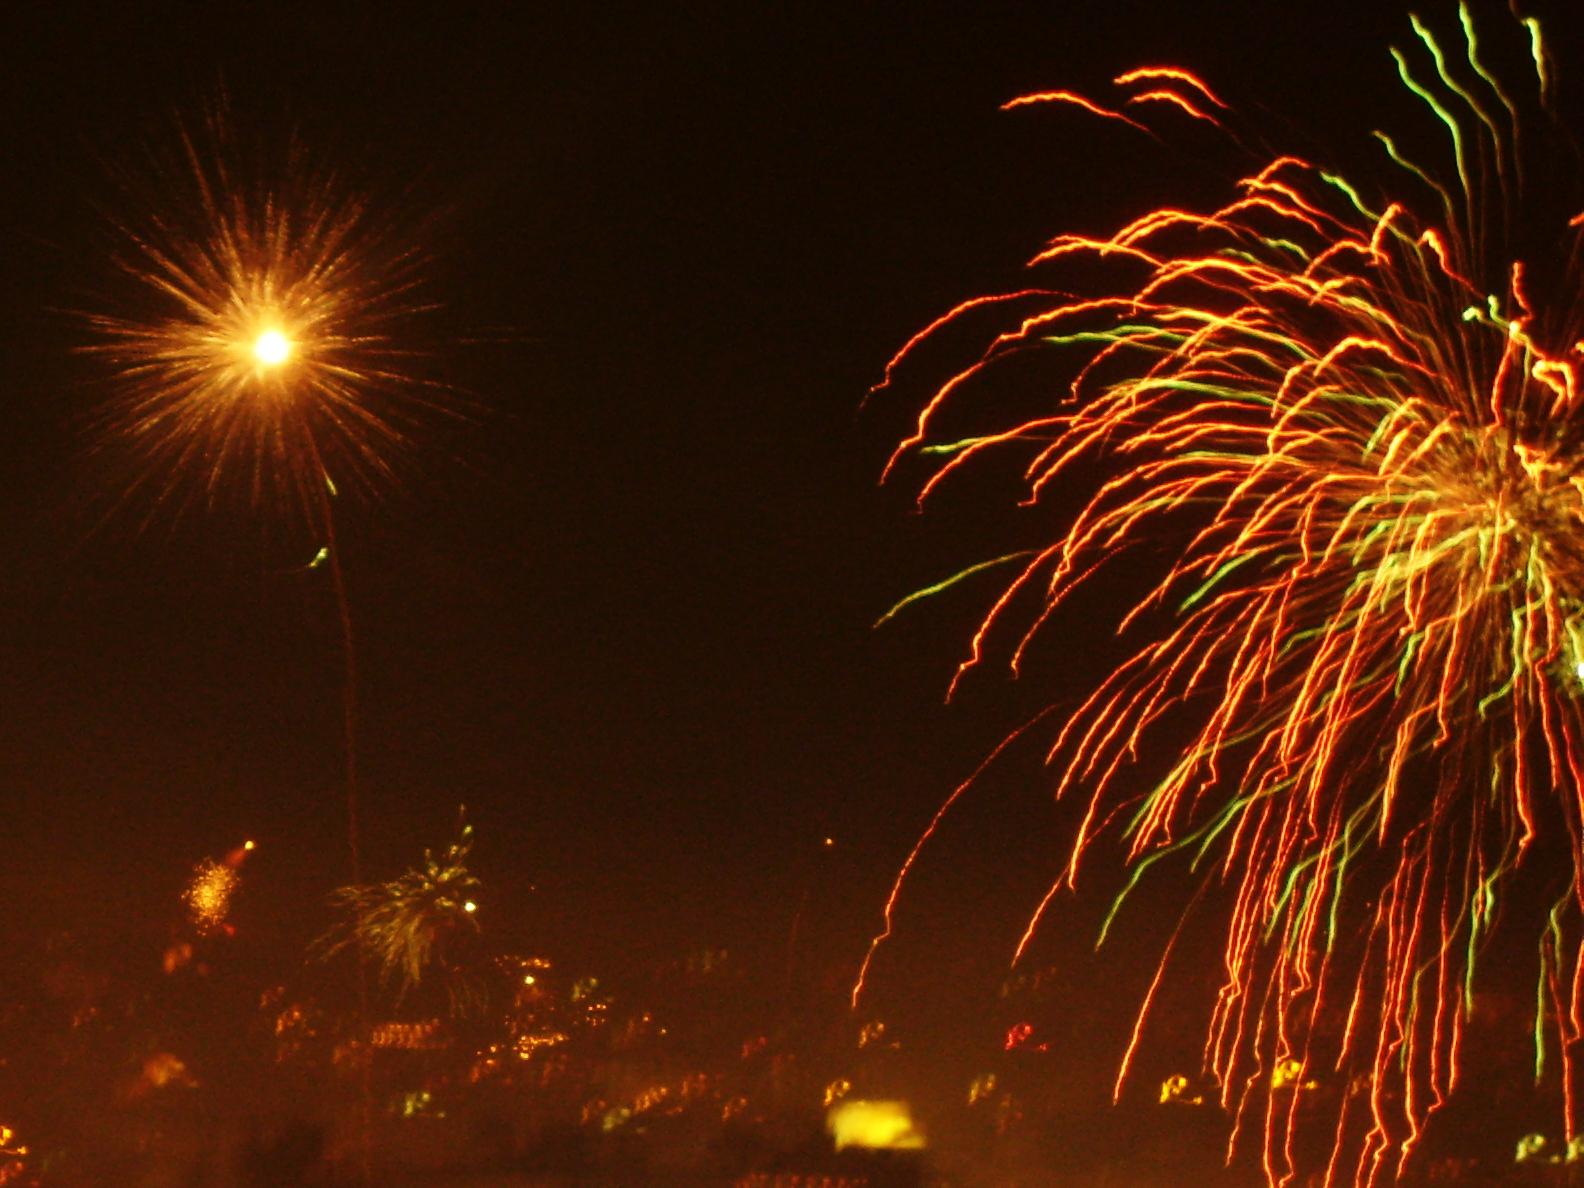 http://4.bp.blogspot.com/-XILalu5MNB0/TnnVVsp3h_I/AAAAAAAAAZ0/8QM83dsJjtY/s1600/Diwali_celebration-wallpaper.jpg